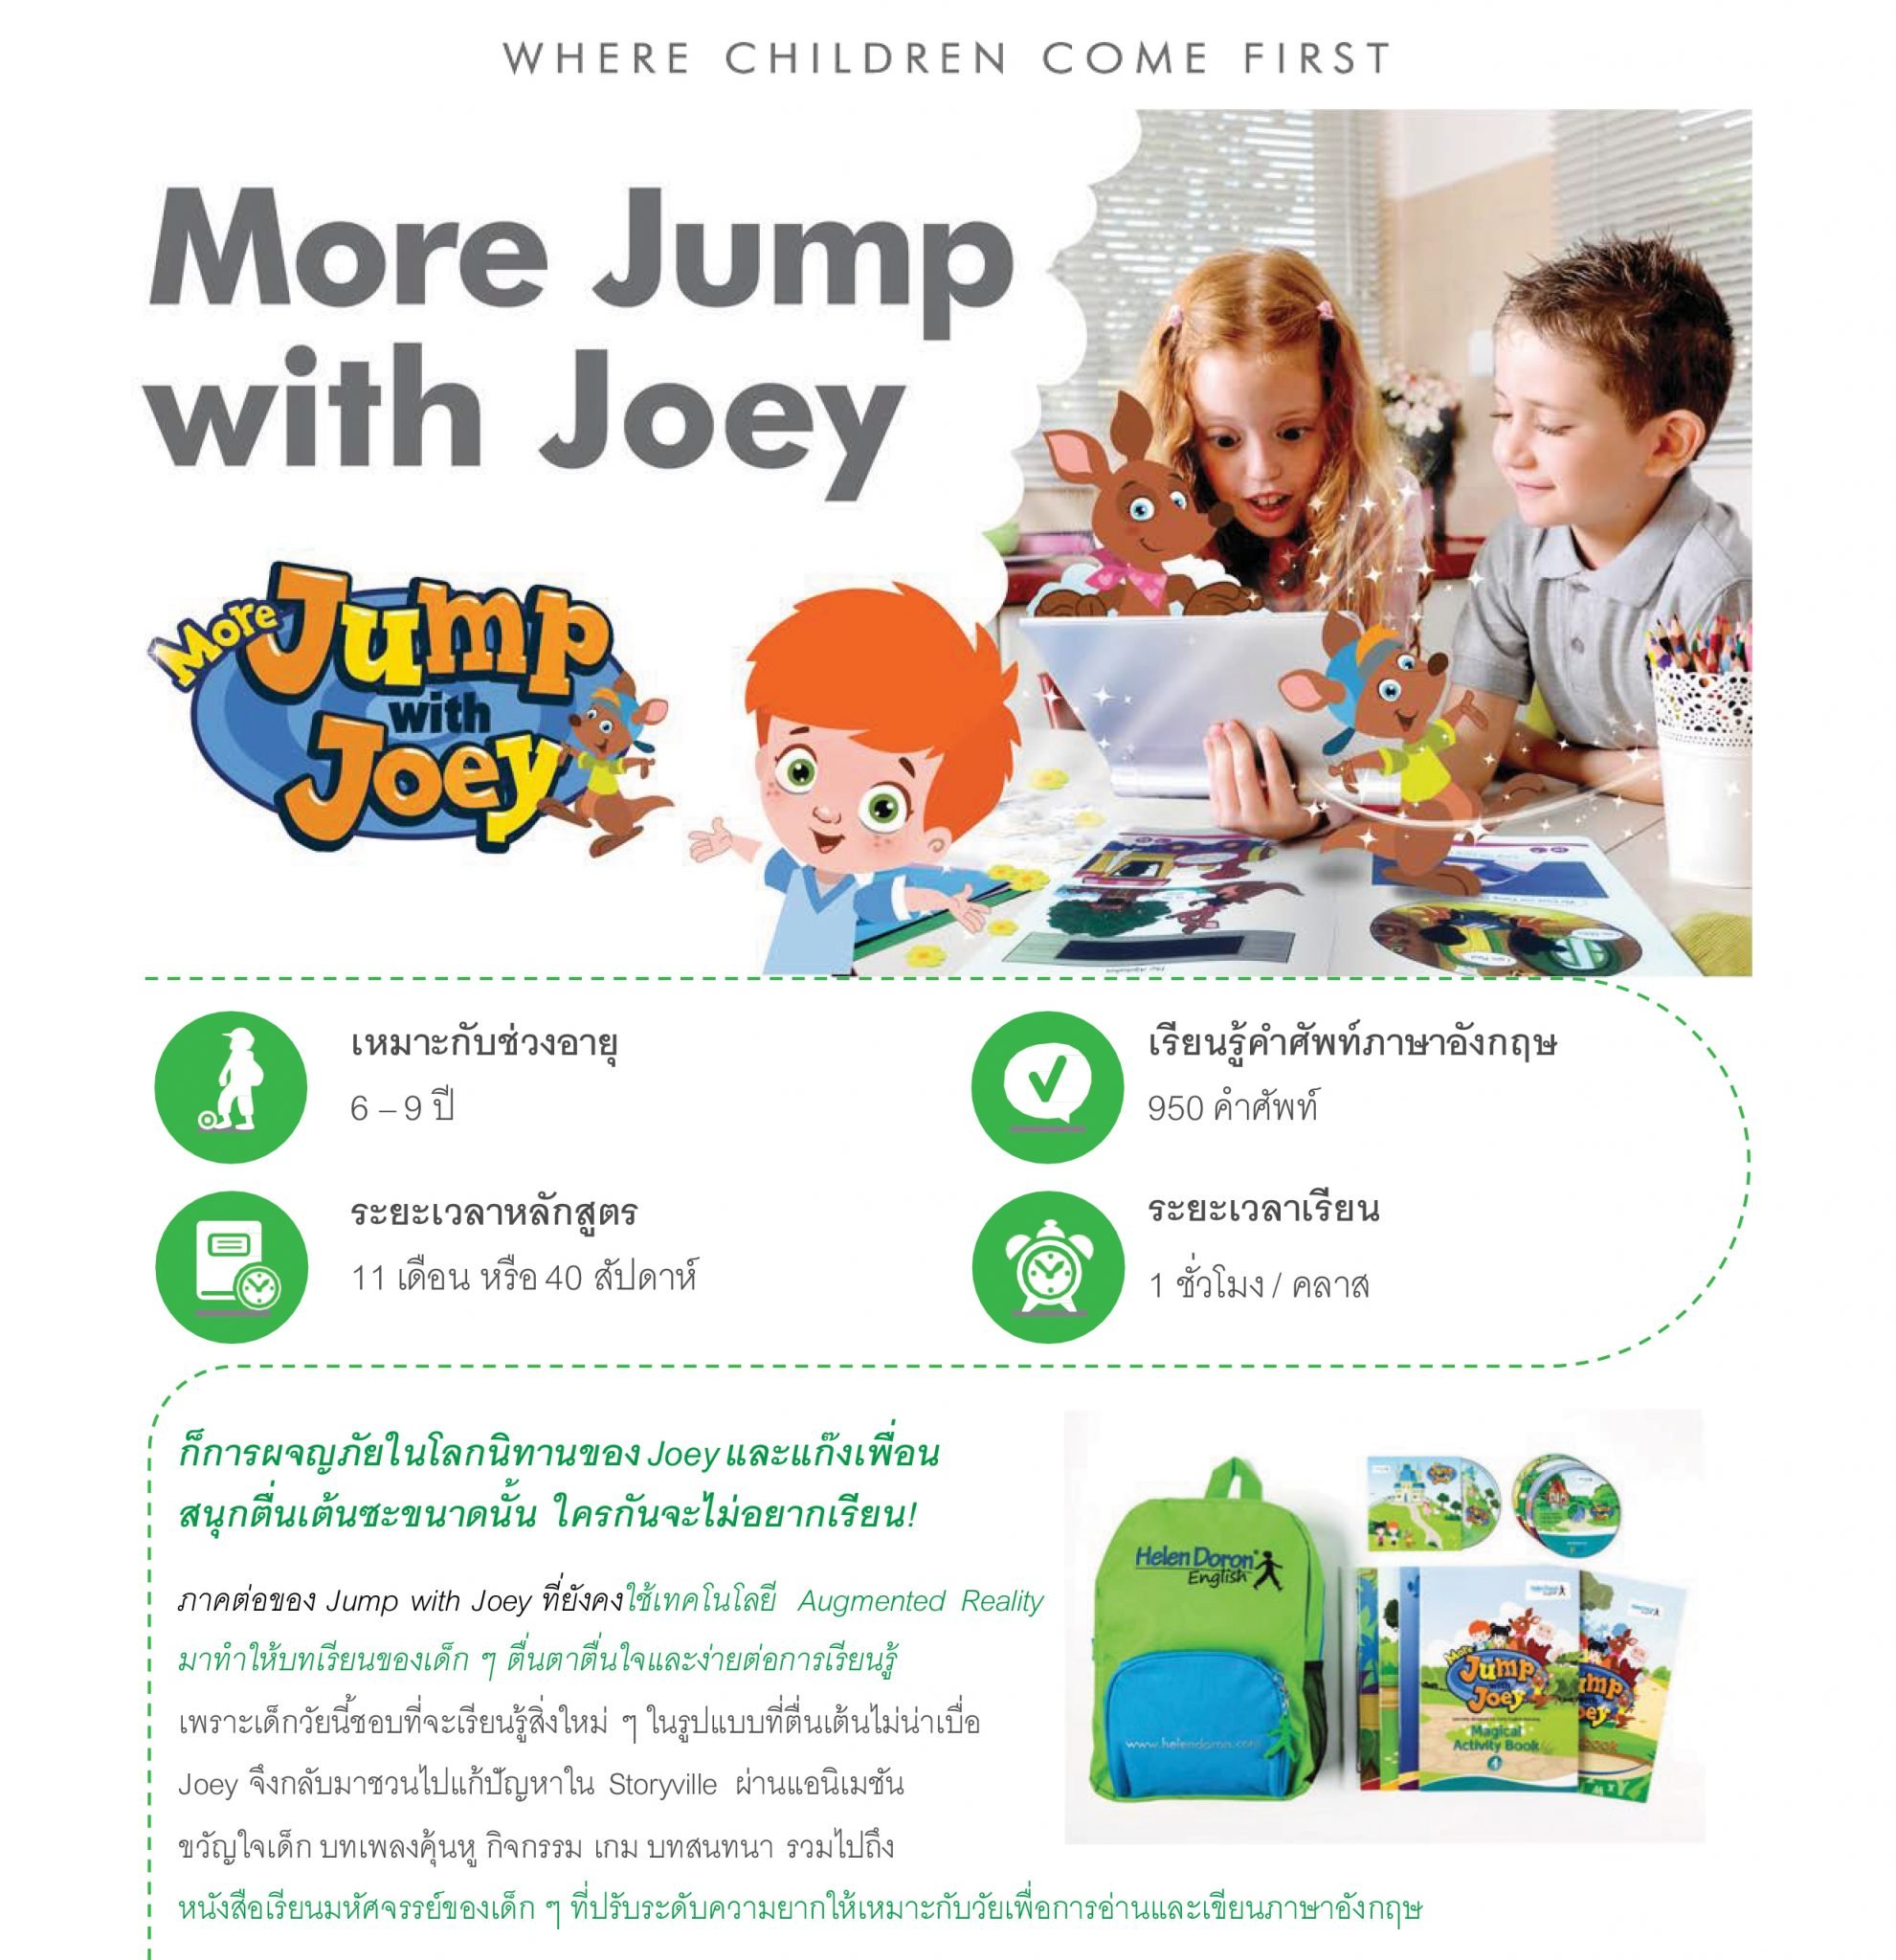 Download - More Jump with Joey สำหรับเด็กอายุ 6 – 9 ปี